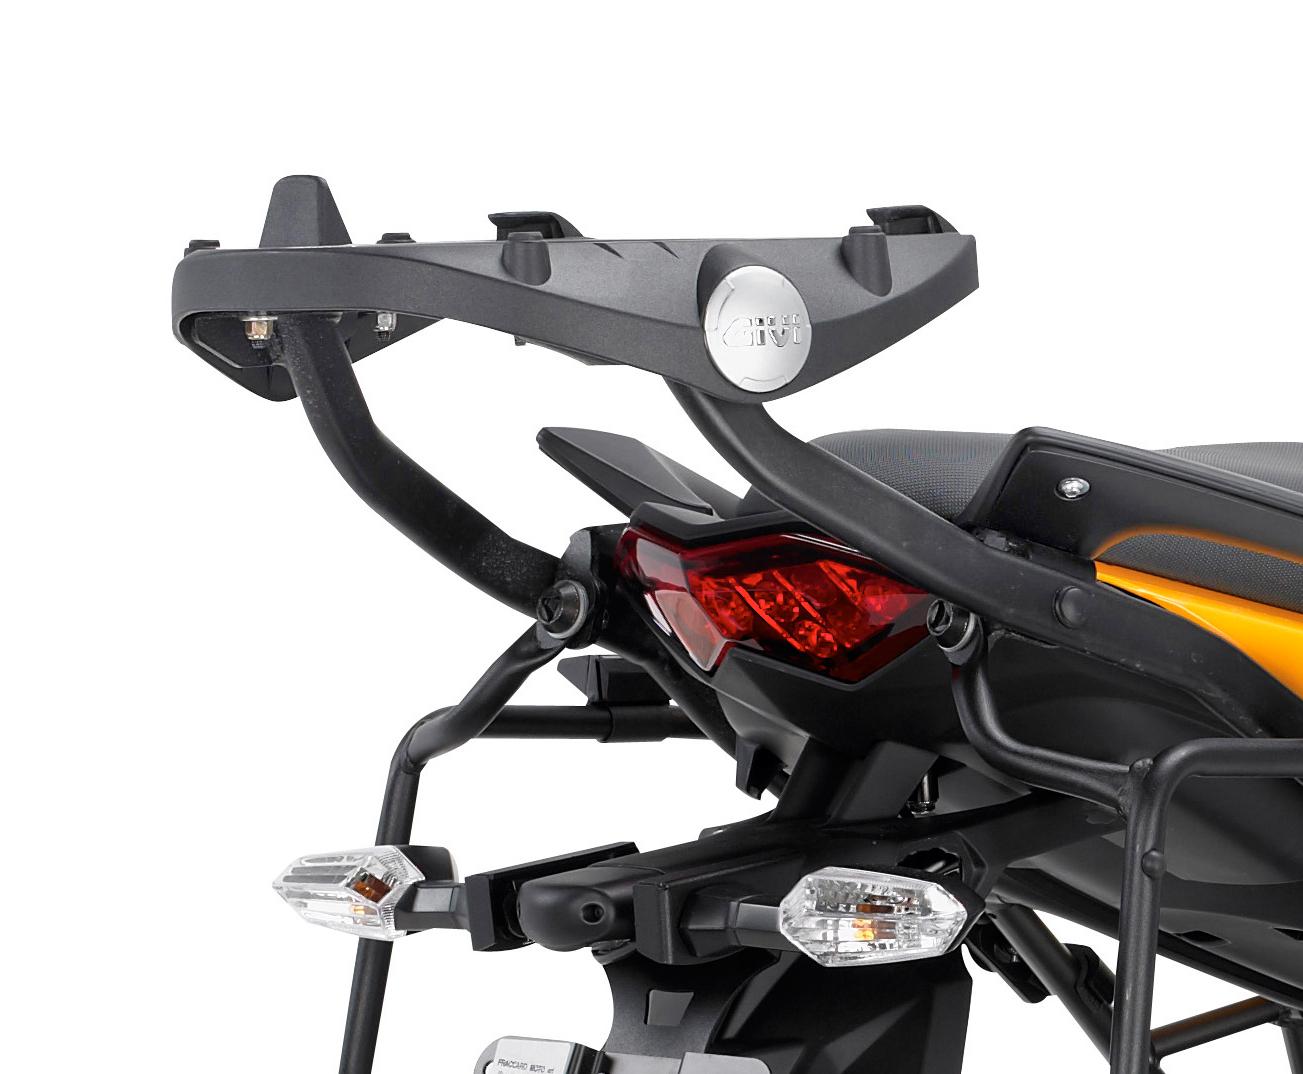 Givi Rack 451fz Wiring Schematic 1994 Kawasaki Klx 650 Monokey Or Monolock Top Case Rear For Versys 10 14